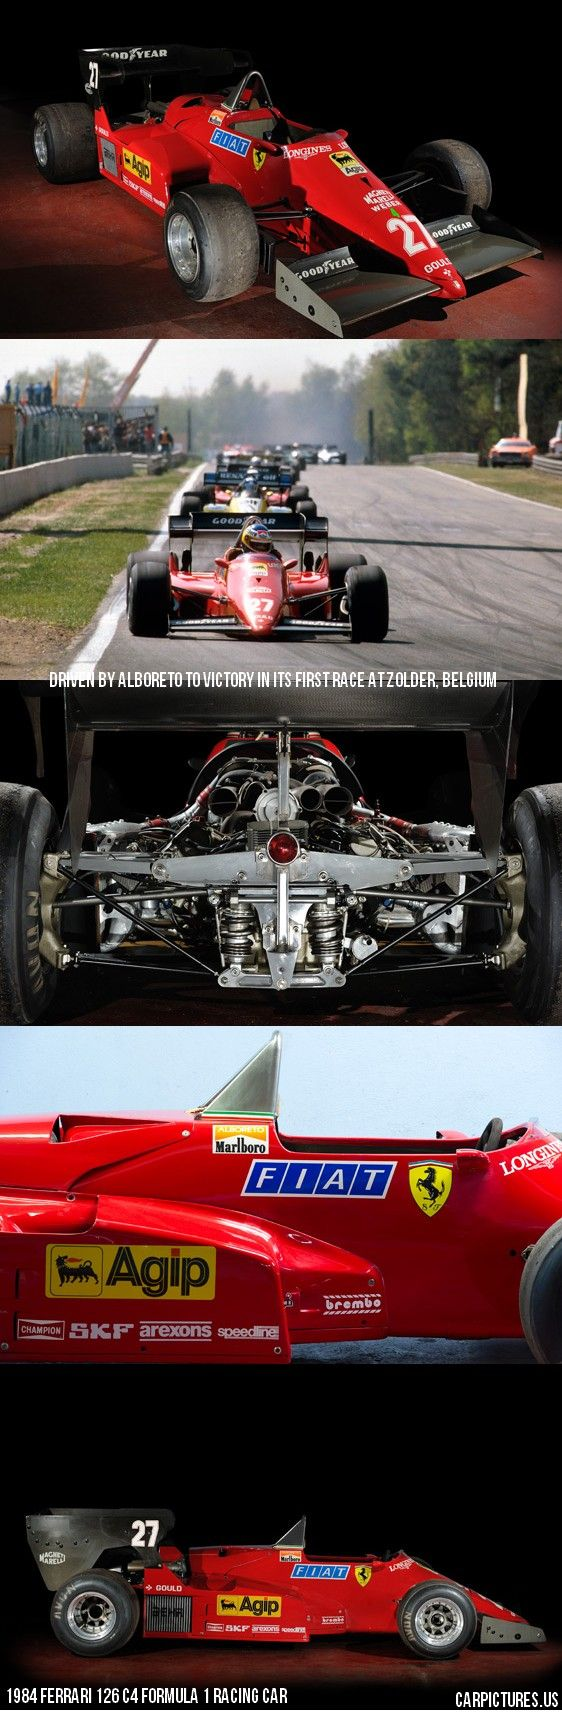 new formula 1 car engine